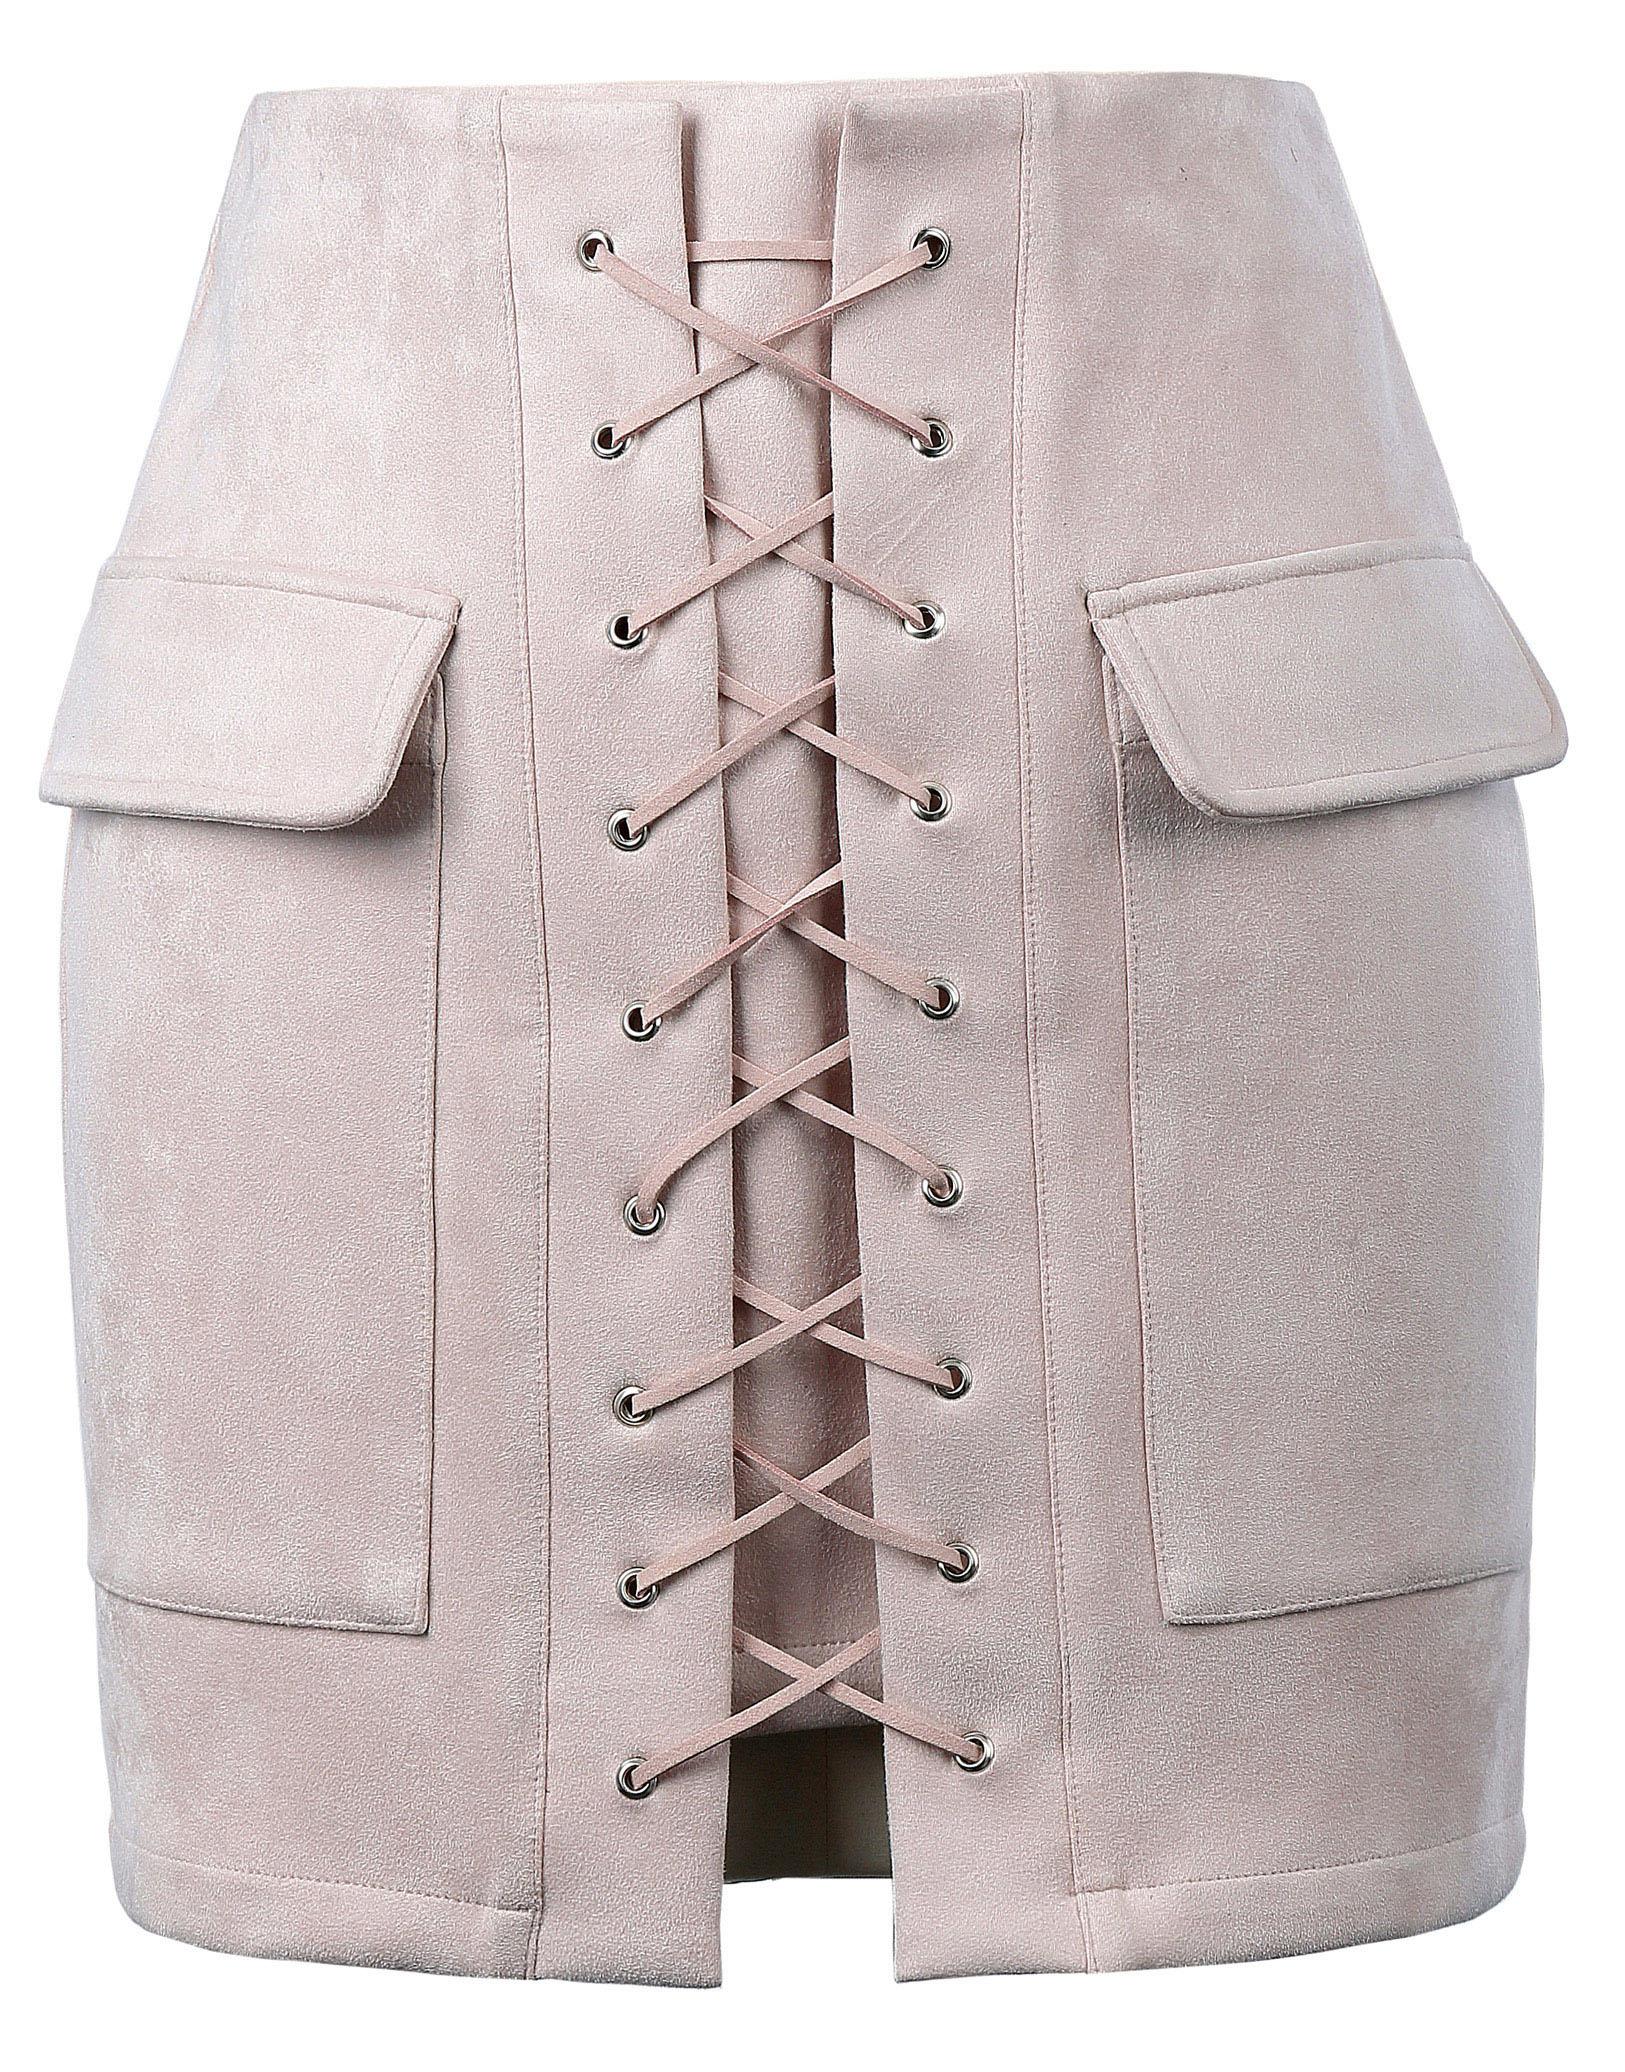 90%Polyester+10%Spandex summer skirt Sexy Women Stylish & Slim Fit High Waist Hips-Wrapped Mini Skirt